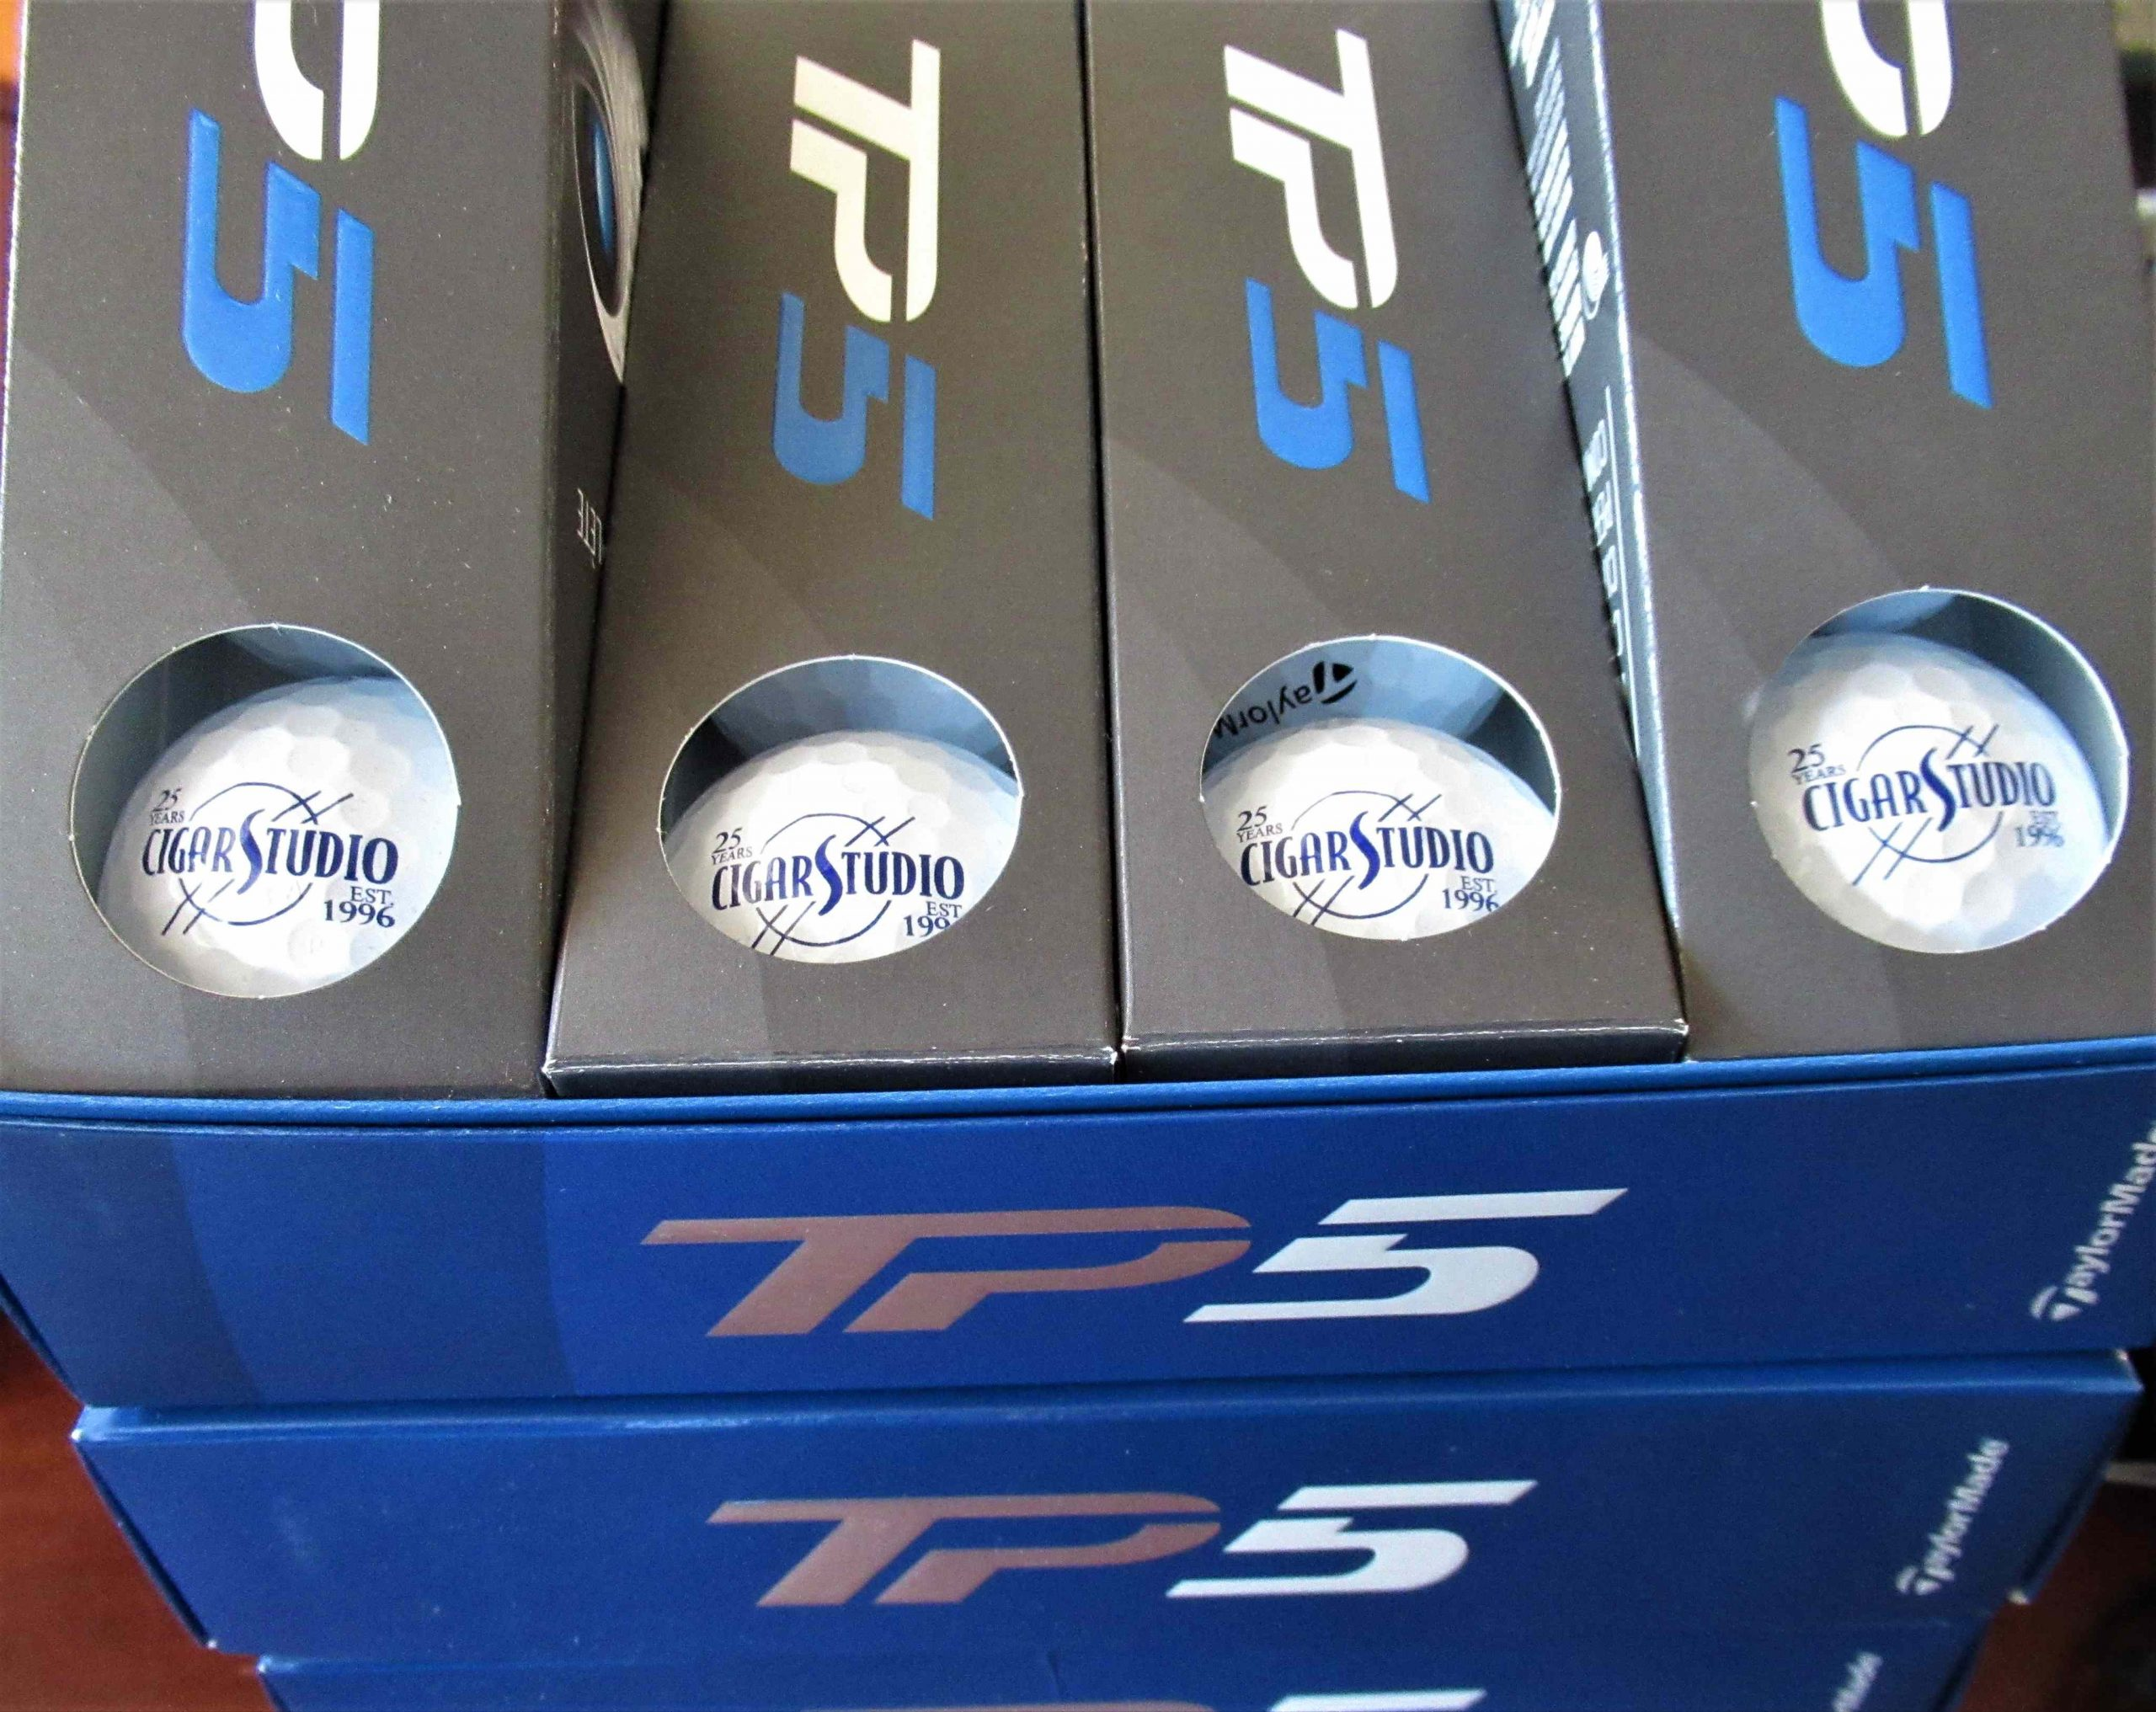 Sleeve of Tailor Made TP5 Golf Balls - Cigar Studio